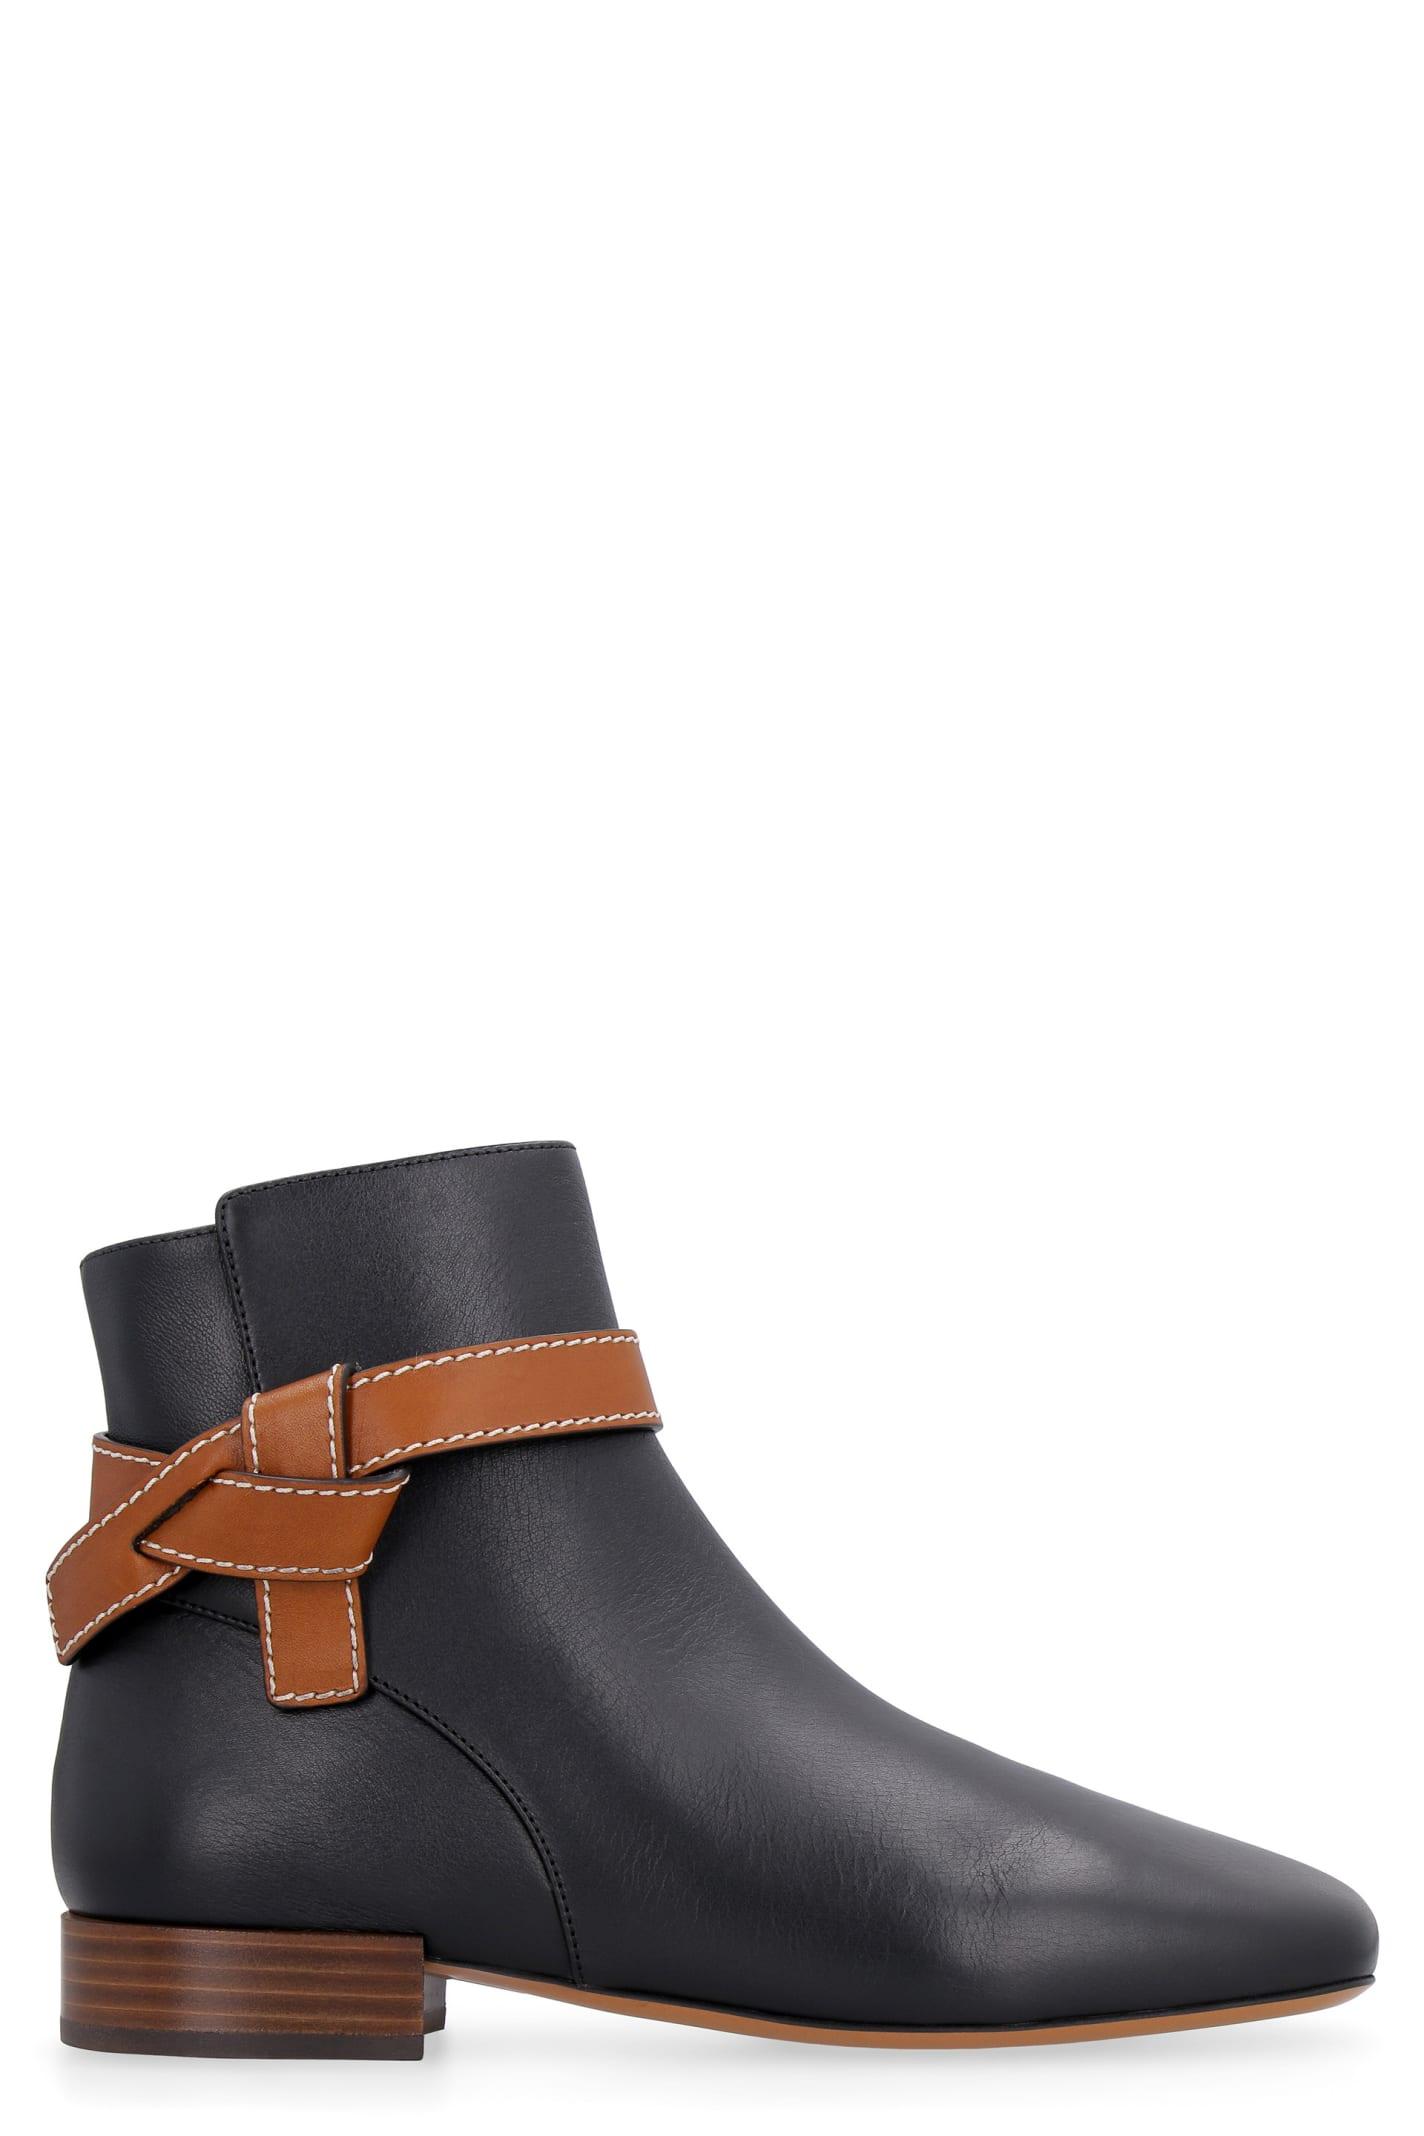 Loewe Leather Gate Boot 25